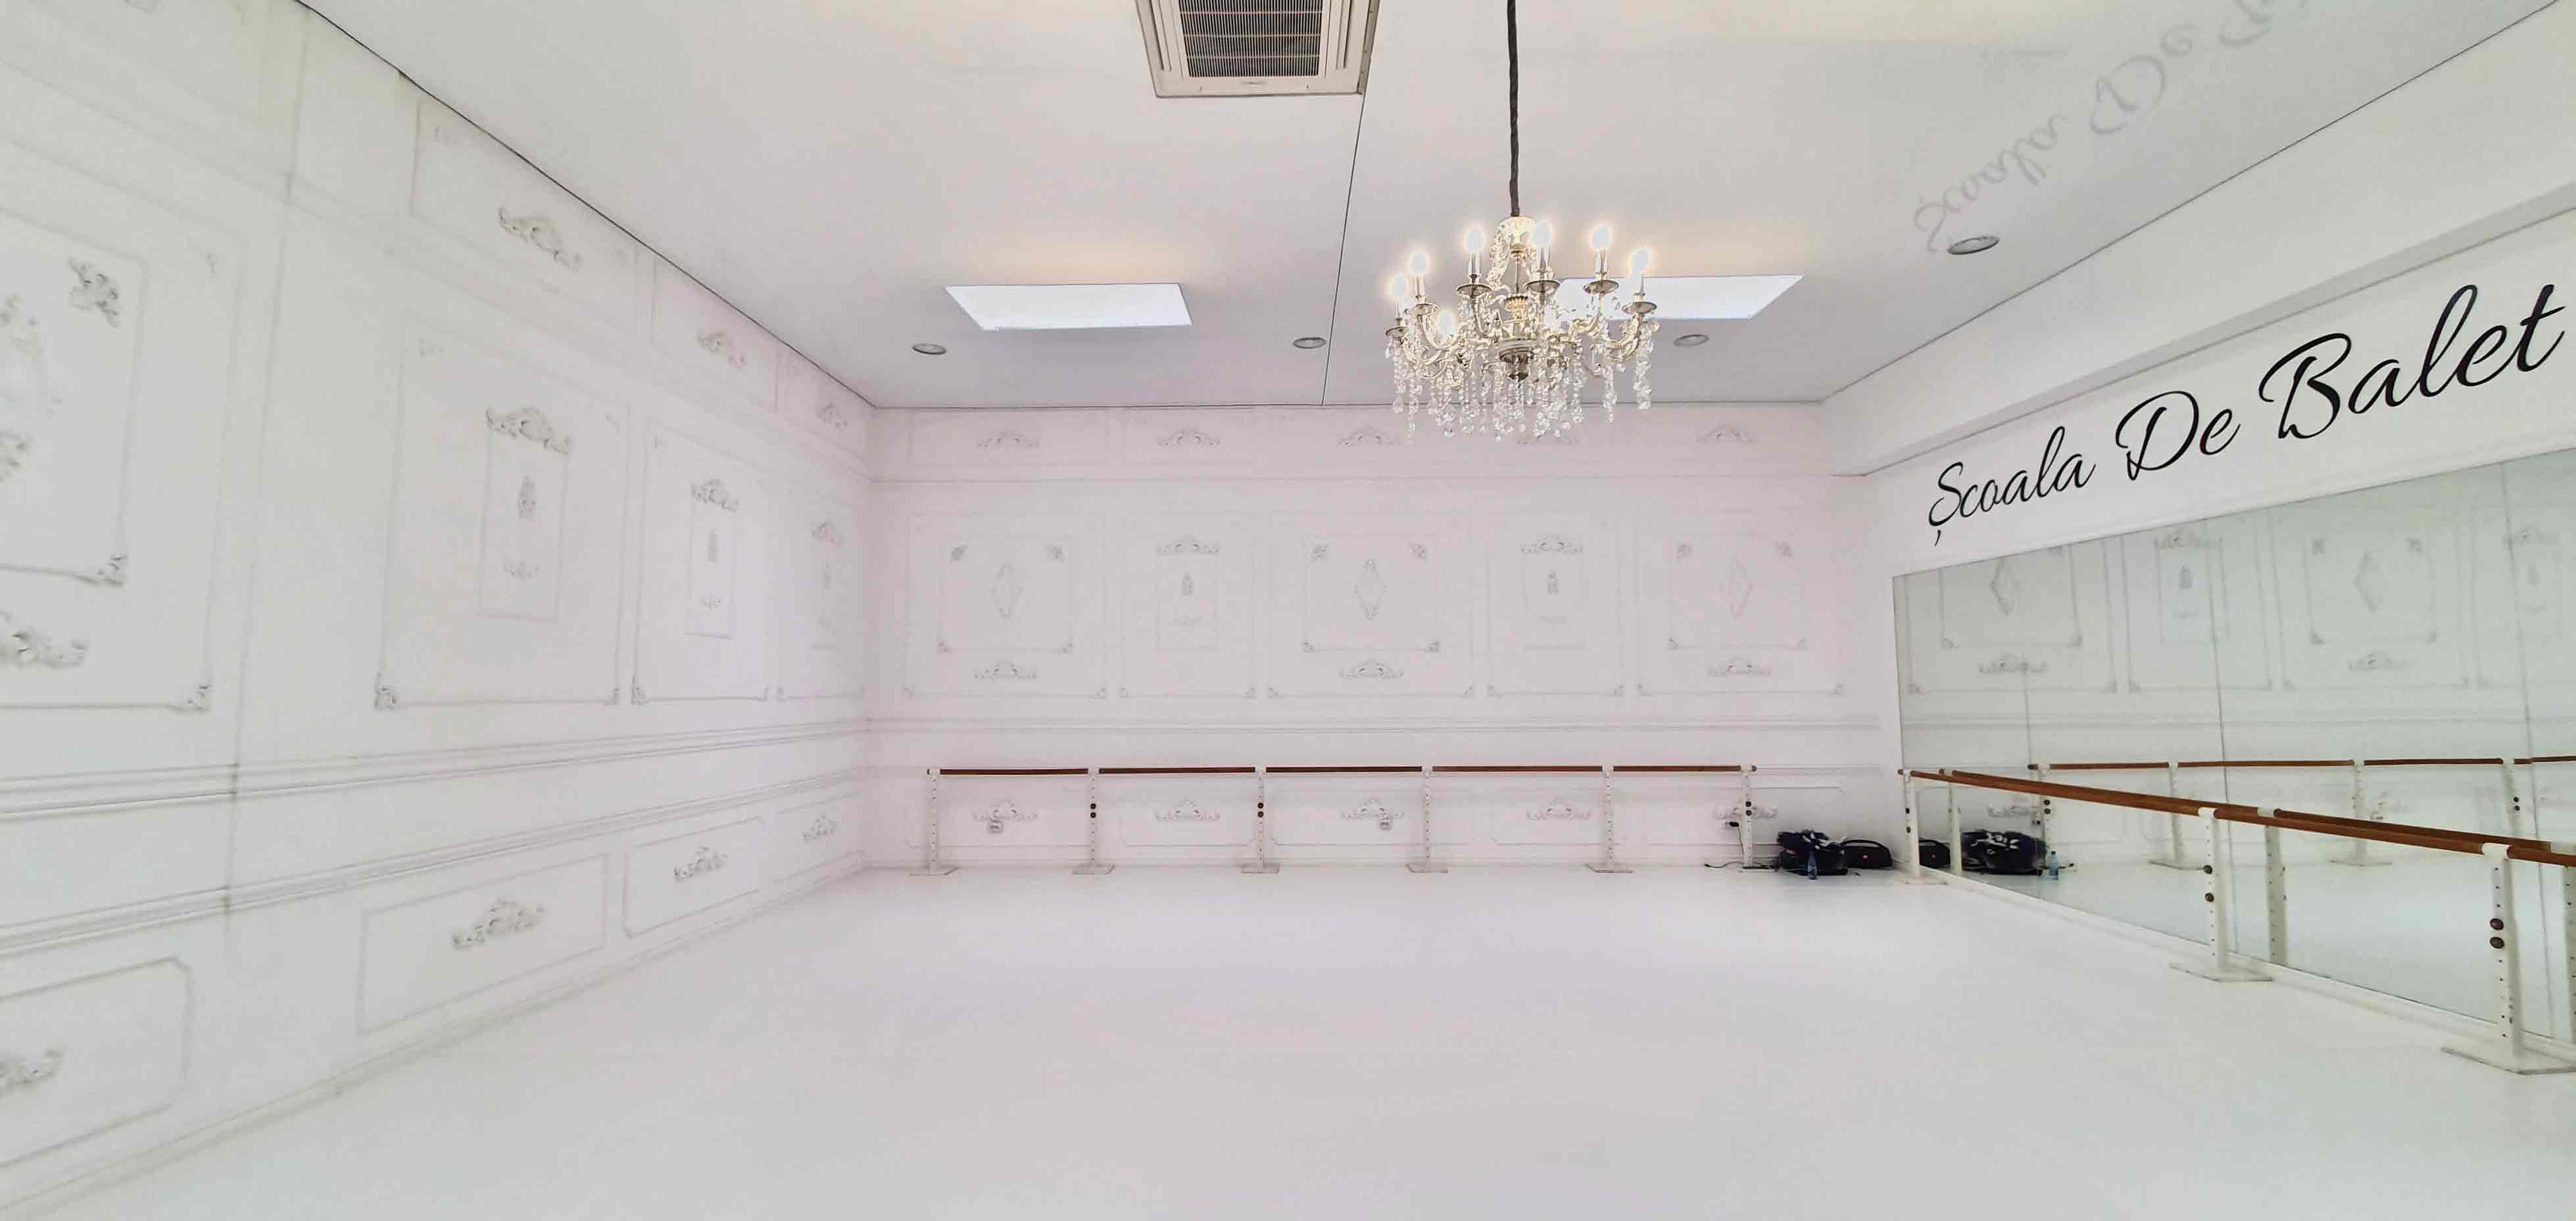 sala de balet